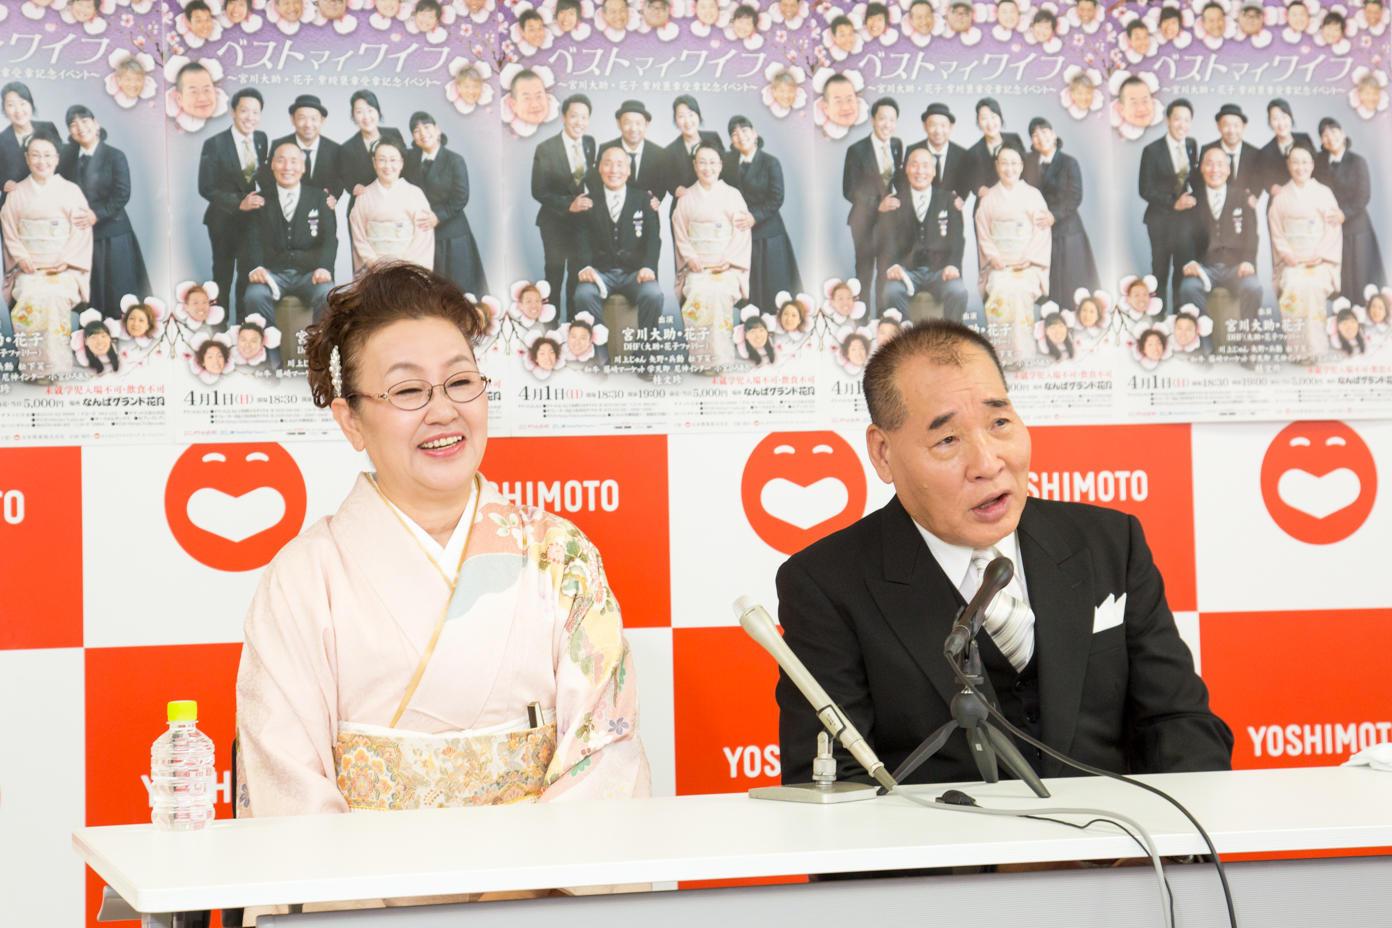 http://news.yoshimoto.co.jp/20180116115132-ac0670965d90089b3a8c19ce9d9b201cfe83cb5c.jpg